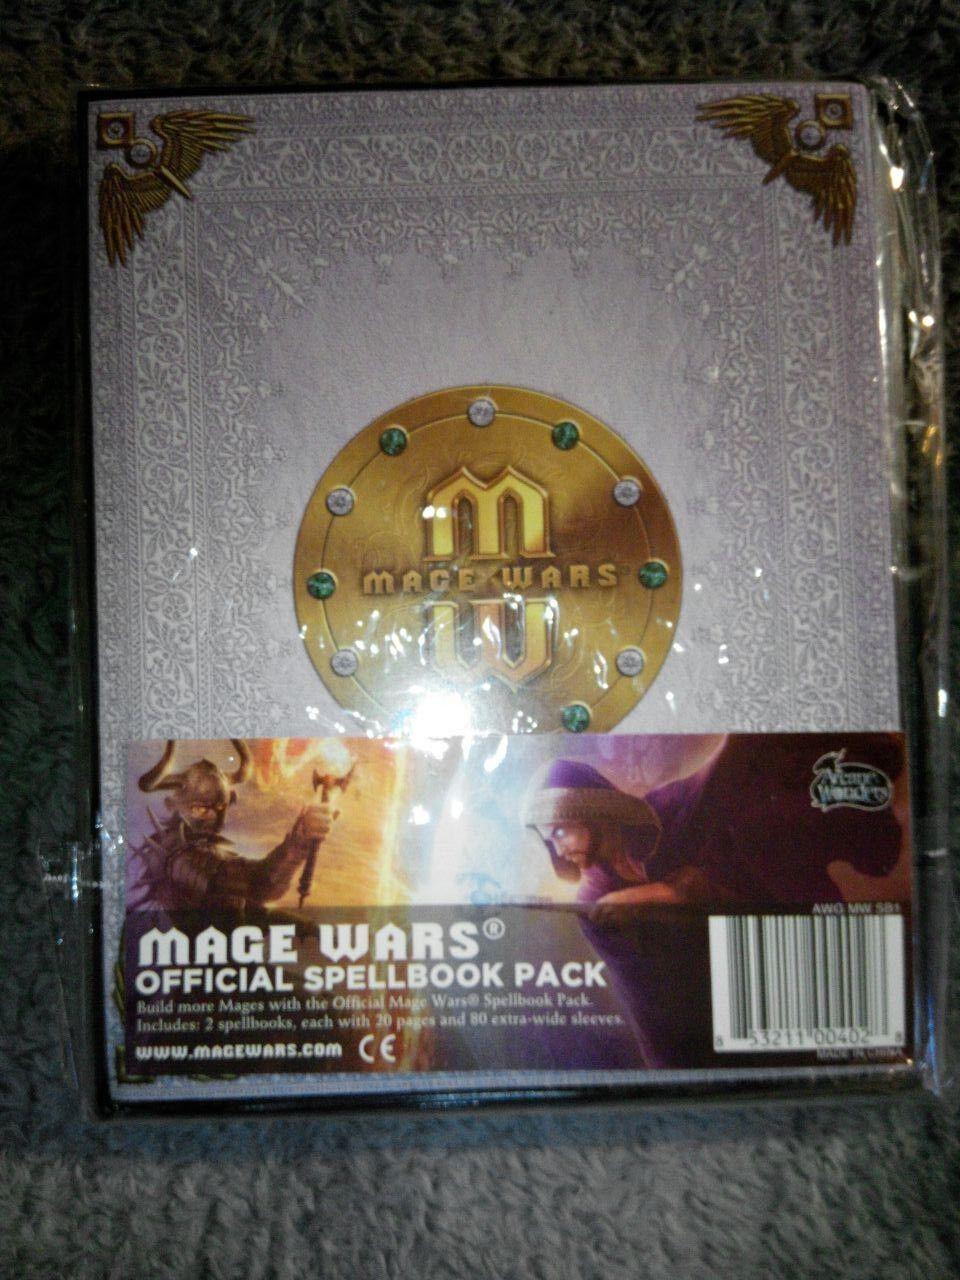 8x Mage Wars Kartenspiel Magierduell Erweiterungen Erweiterungen Erweiterungen Promo Karten (OP Kits) neu 57cd4c